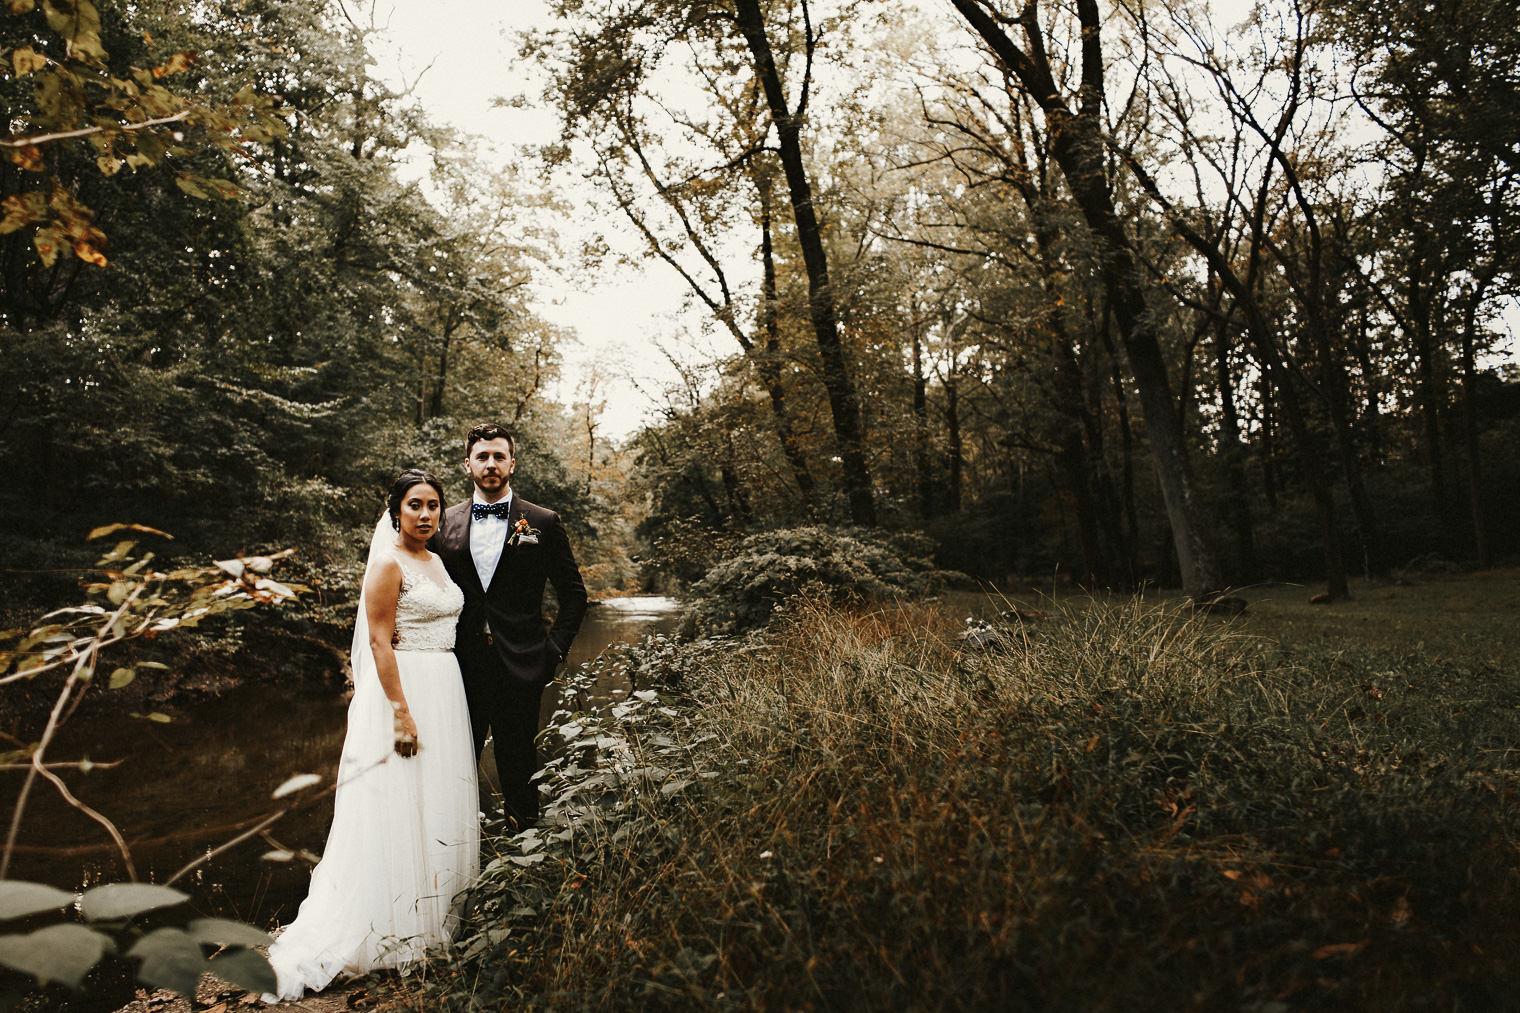 Amy-Mike-wedding-blog-75.jpg